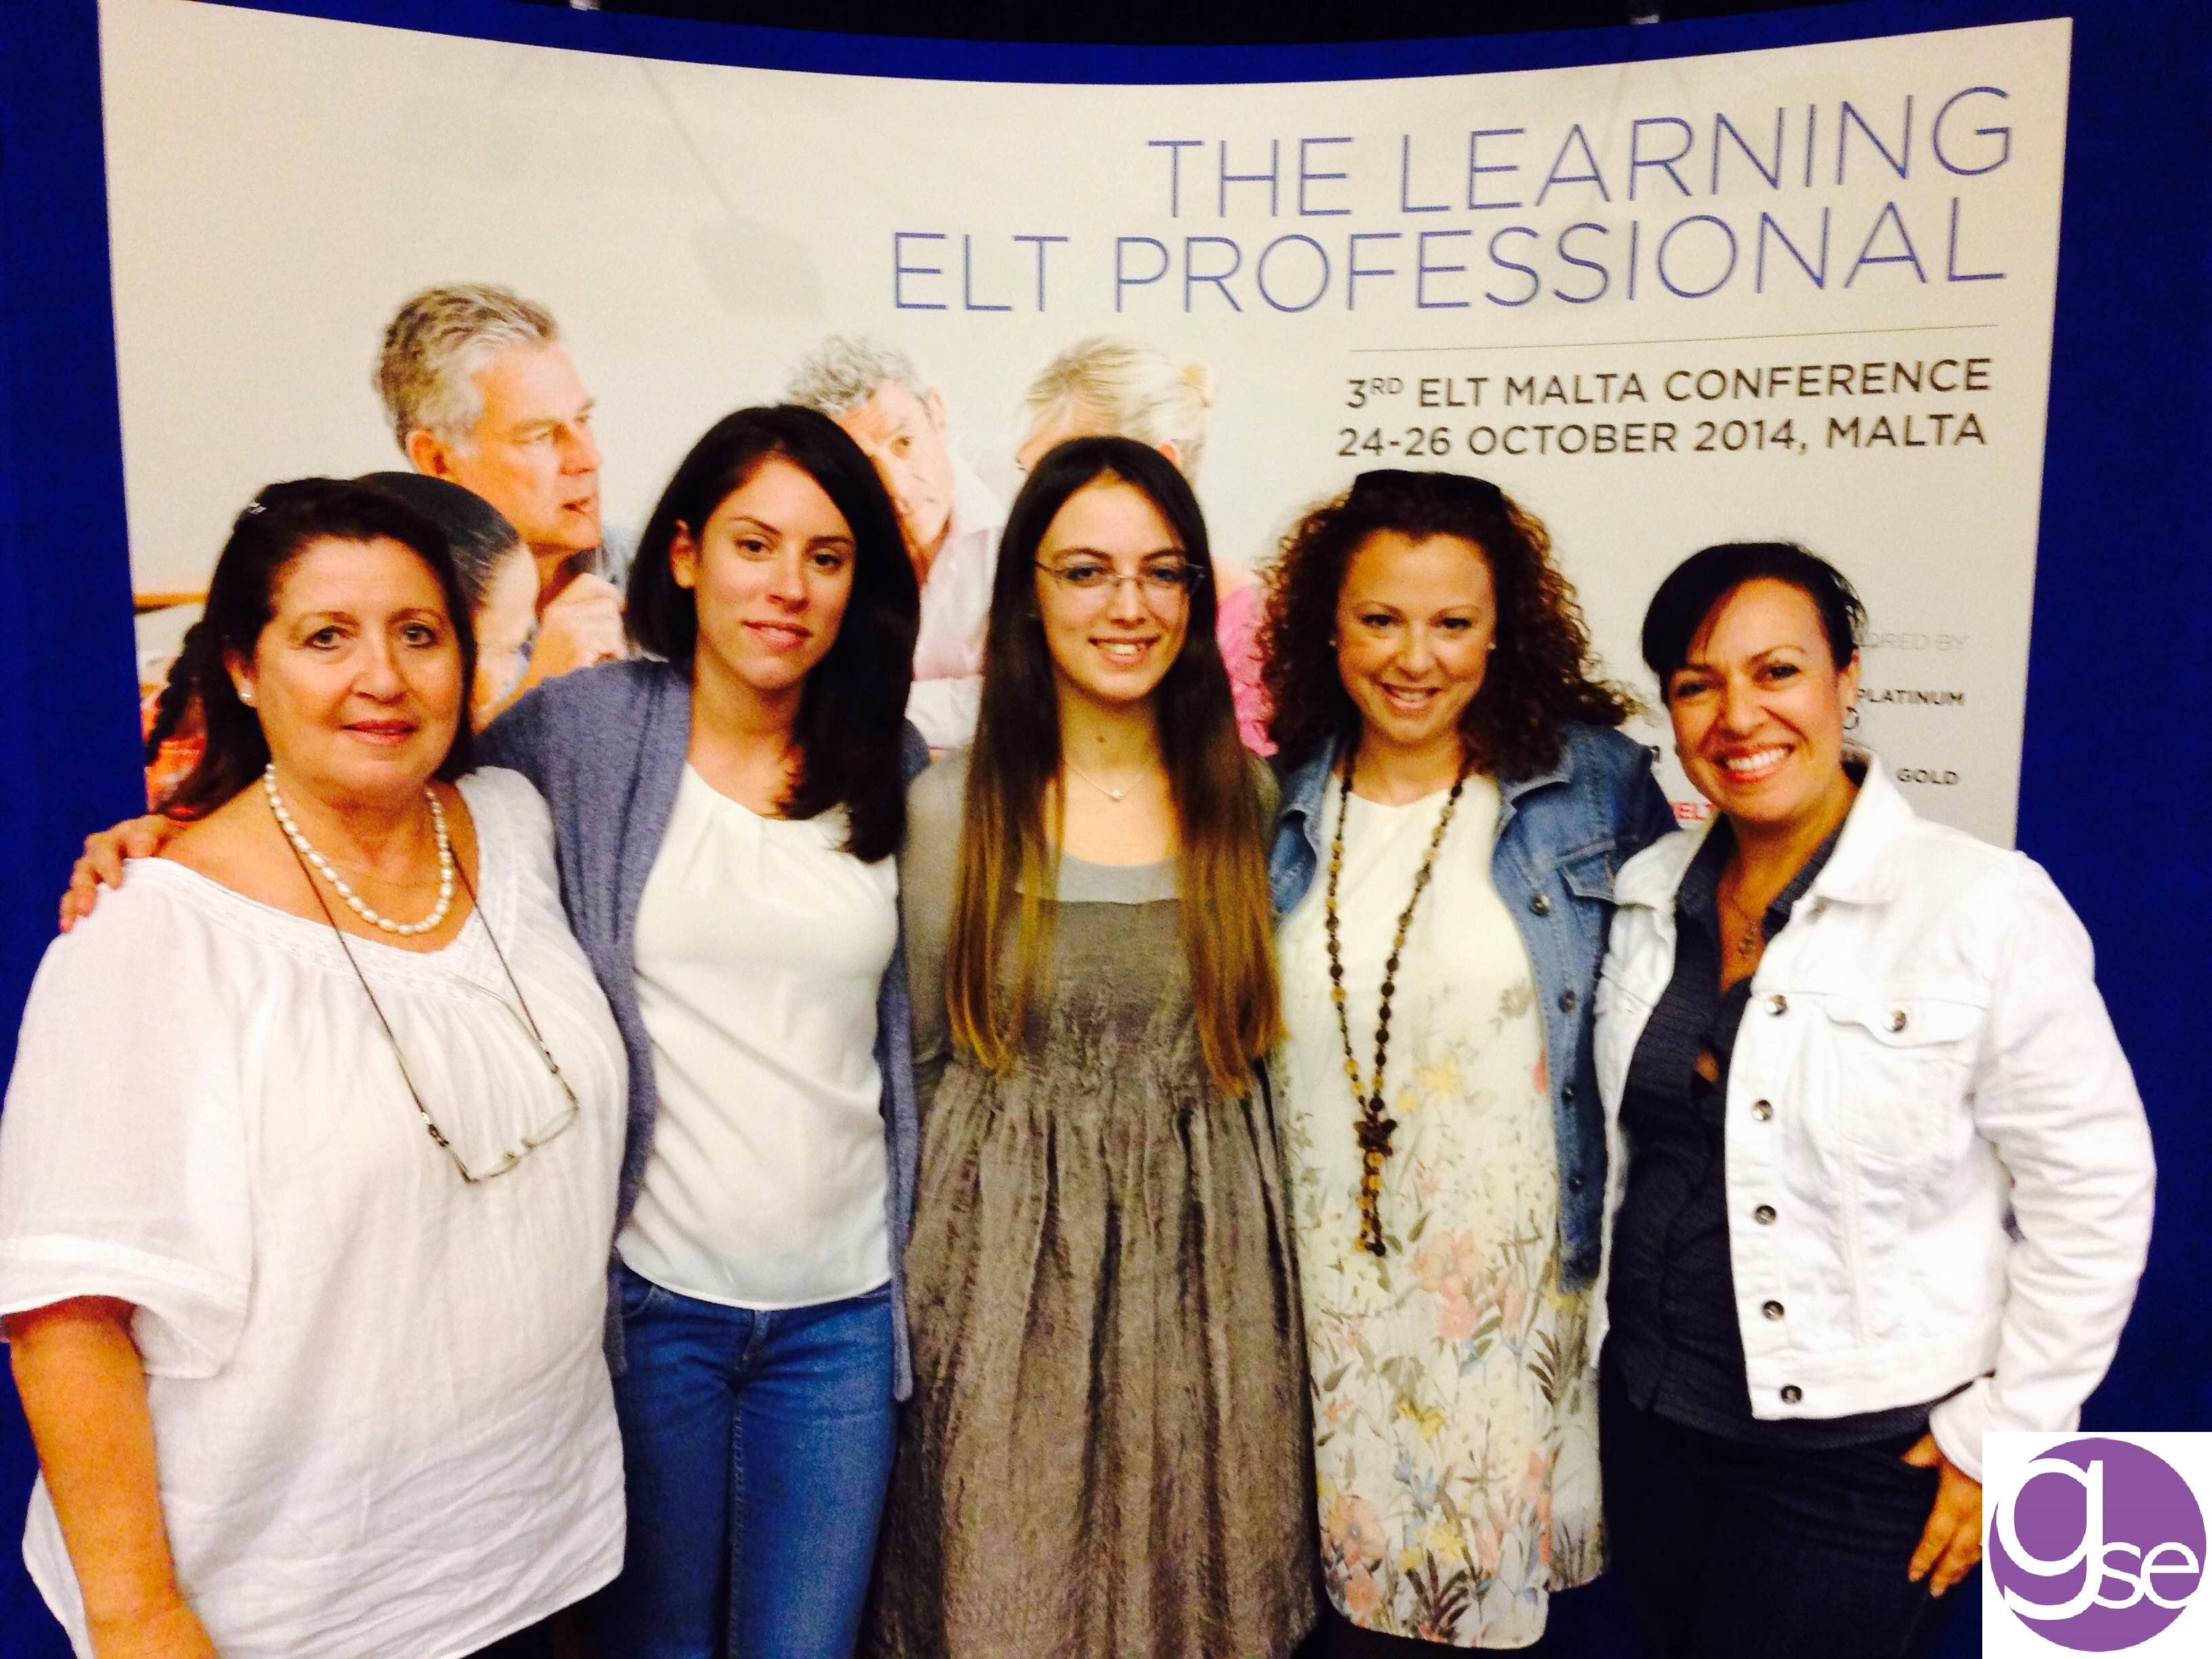 GSE Malta Ingilizce Kursu Akademik Takimi ELT Konferansinda iken